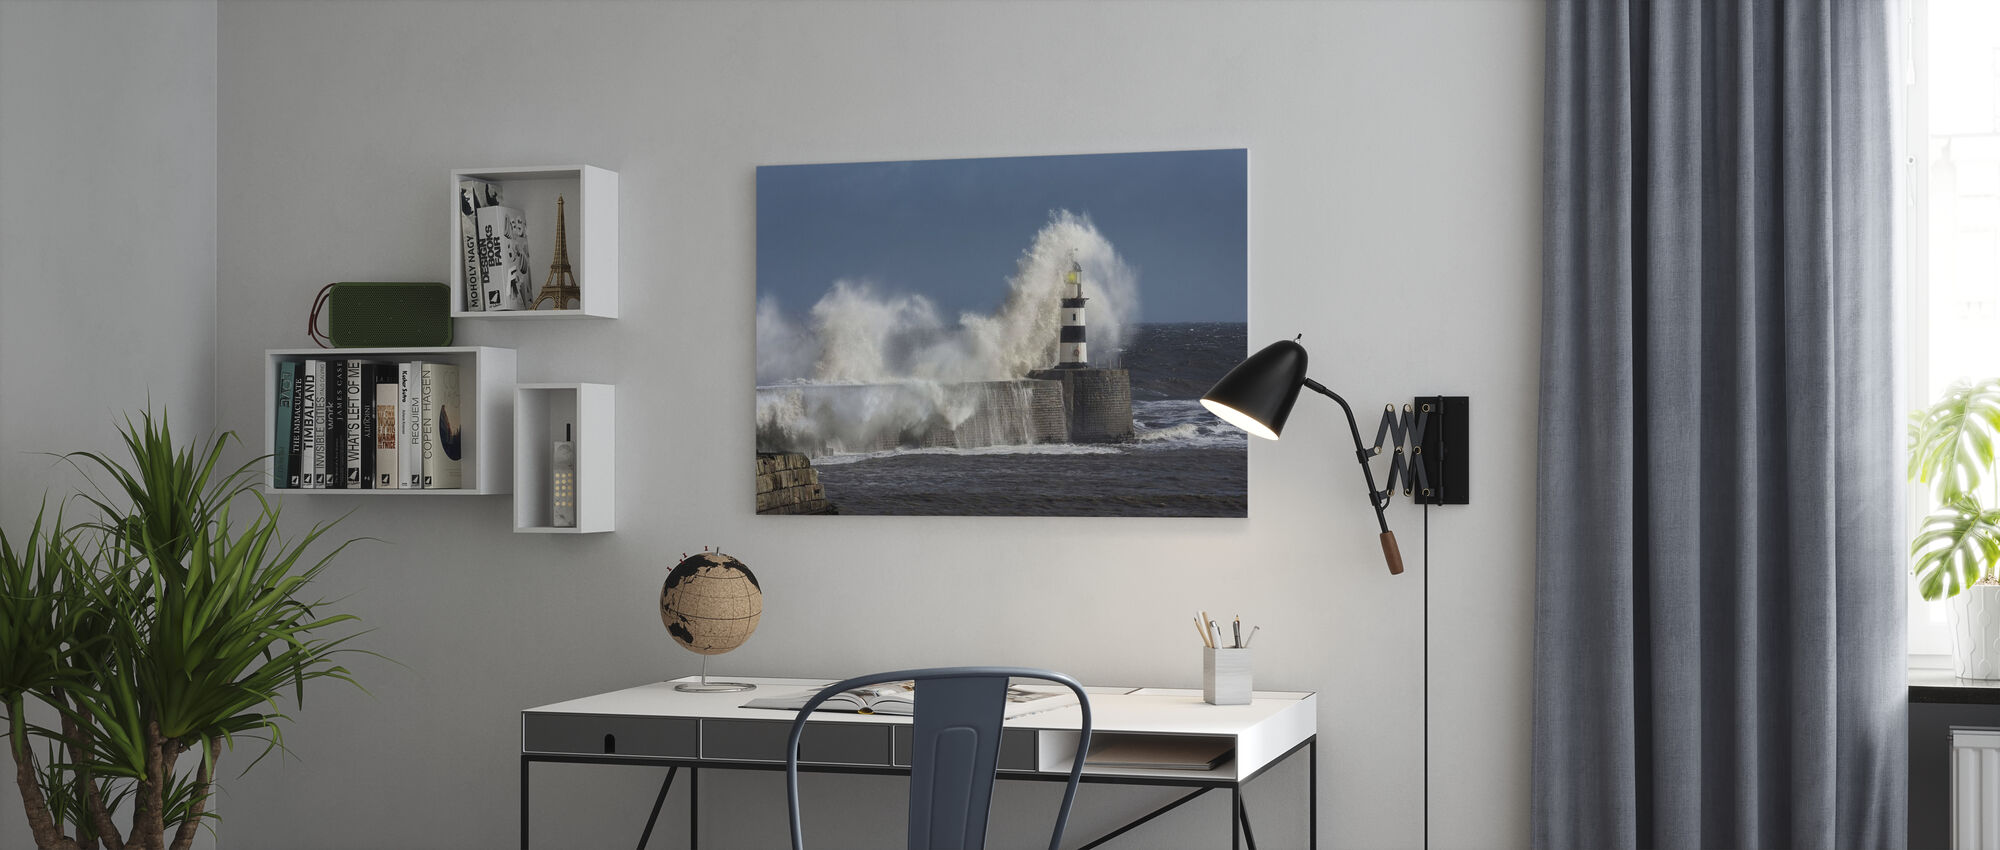 Rough Sea vid Seaham fyr i England - Canvastavla - Kontor